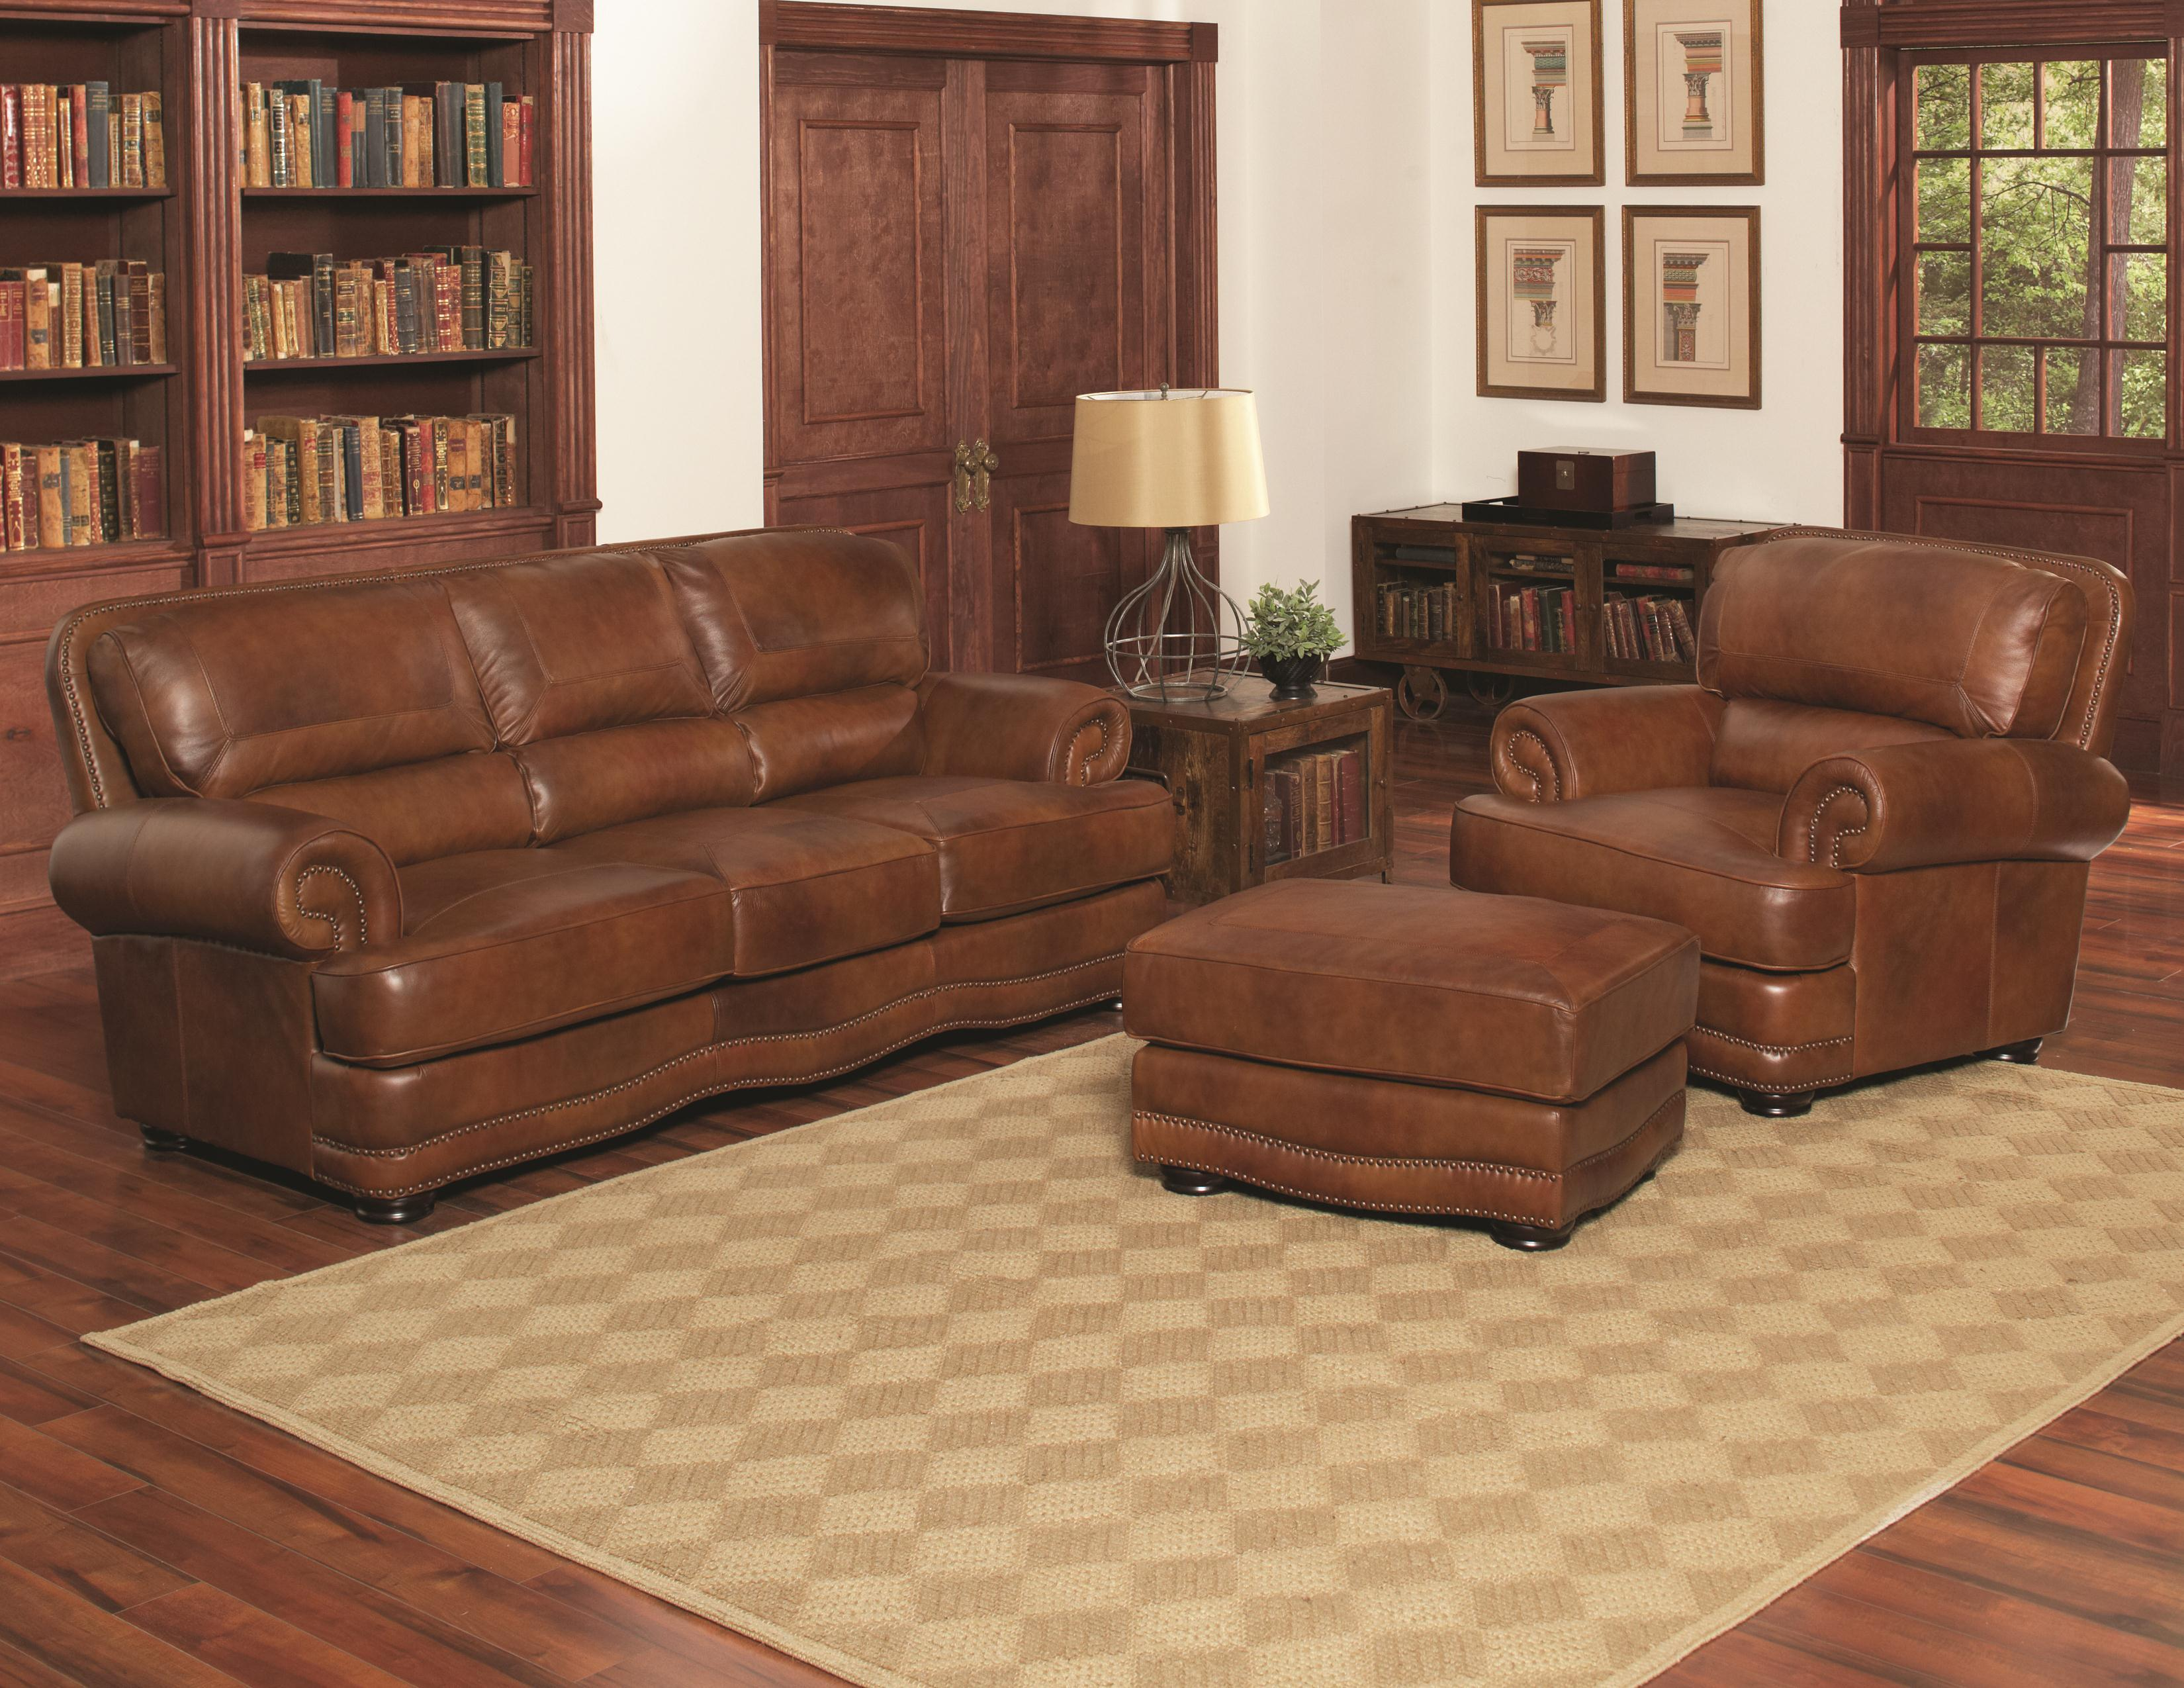 Lovely Largo Remington Stationary Living Room Group   Item Number: L1250 Living  Room Group